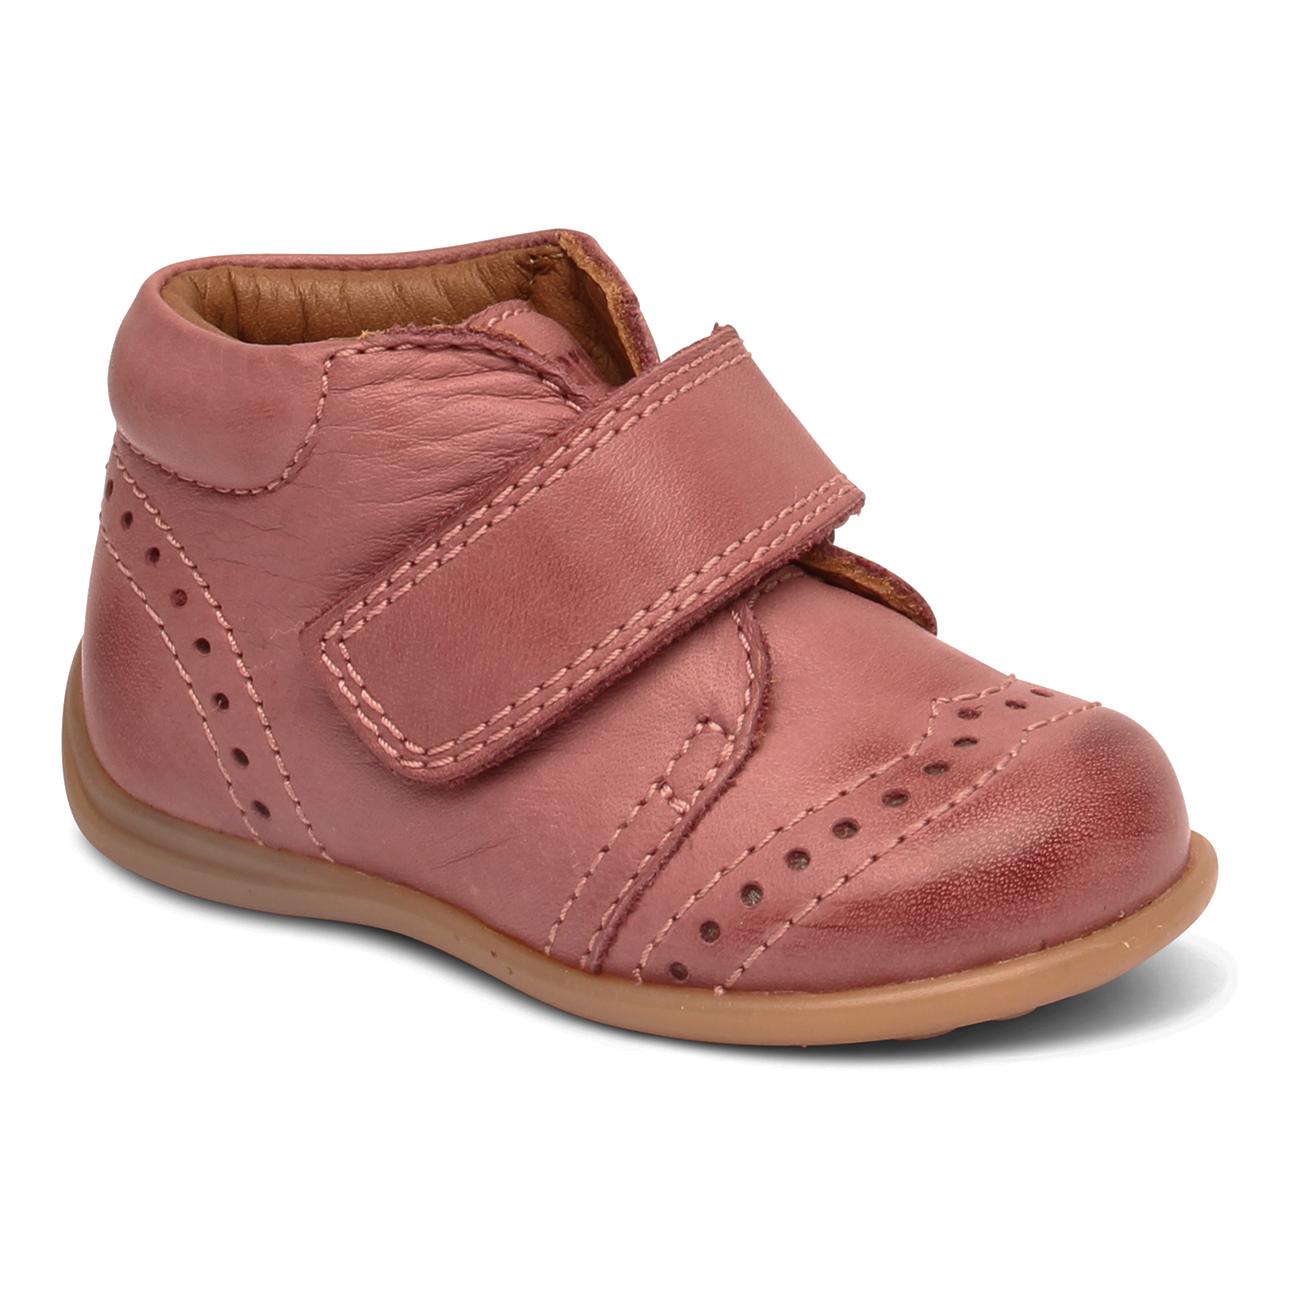 f733fa09493a Bisgaard-begyndersko-sko-shoes-pink-lilla-velcro